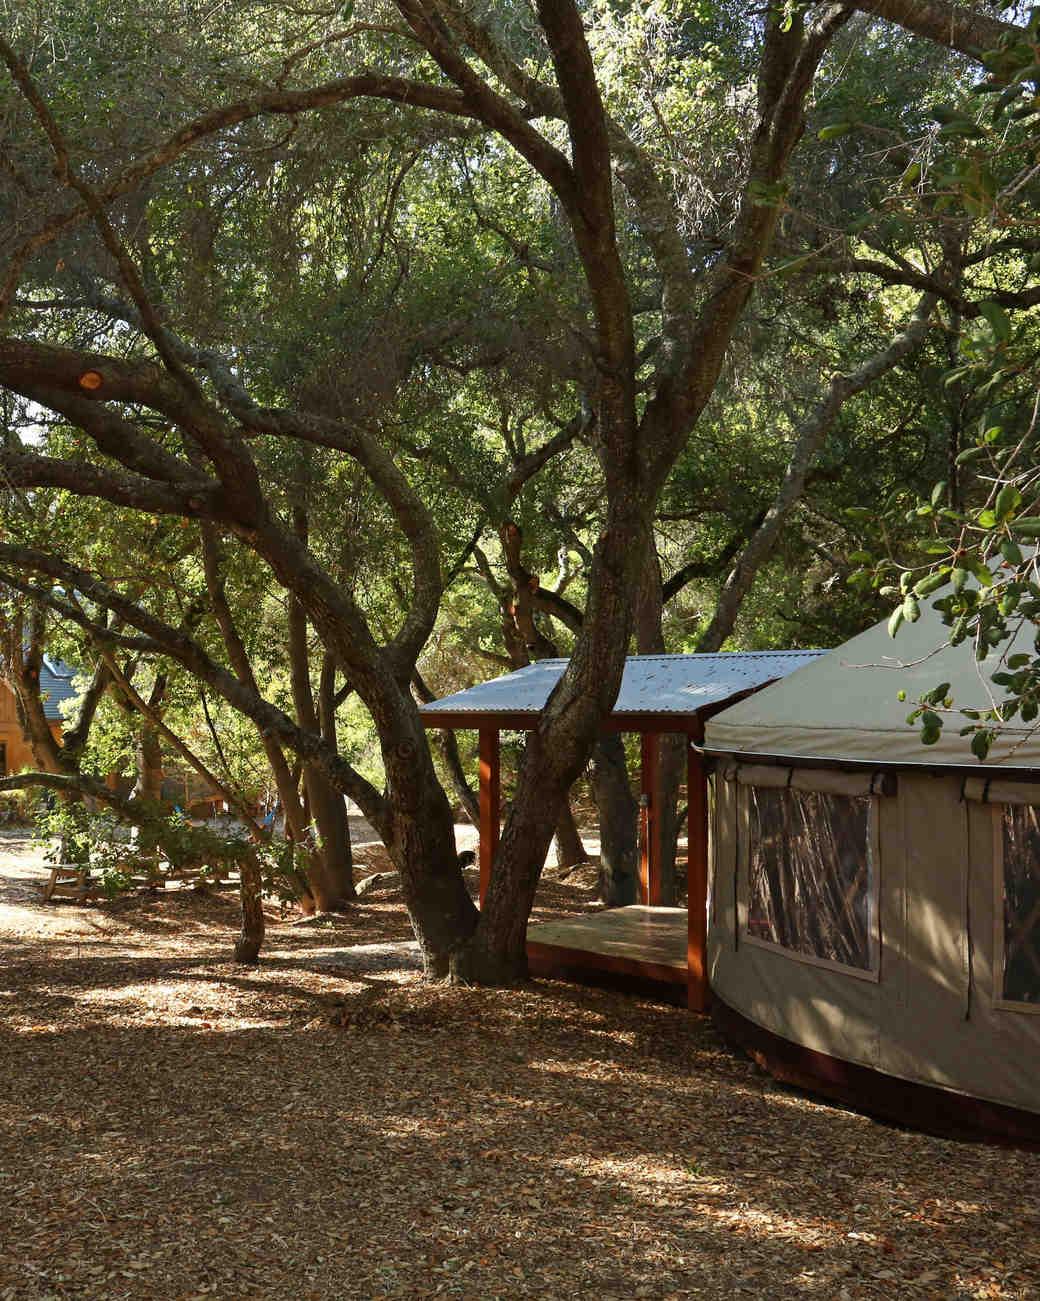 bachelorette-camping-wellspring-ranch-camping-1014.jpg